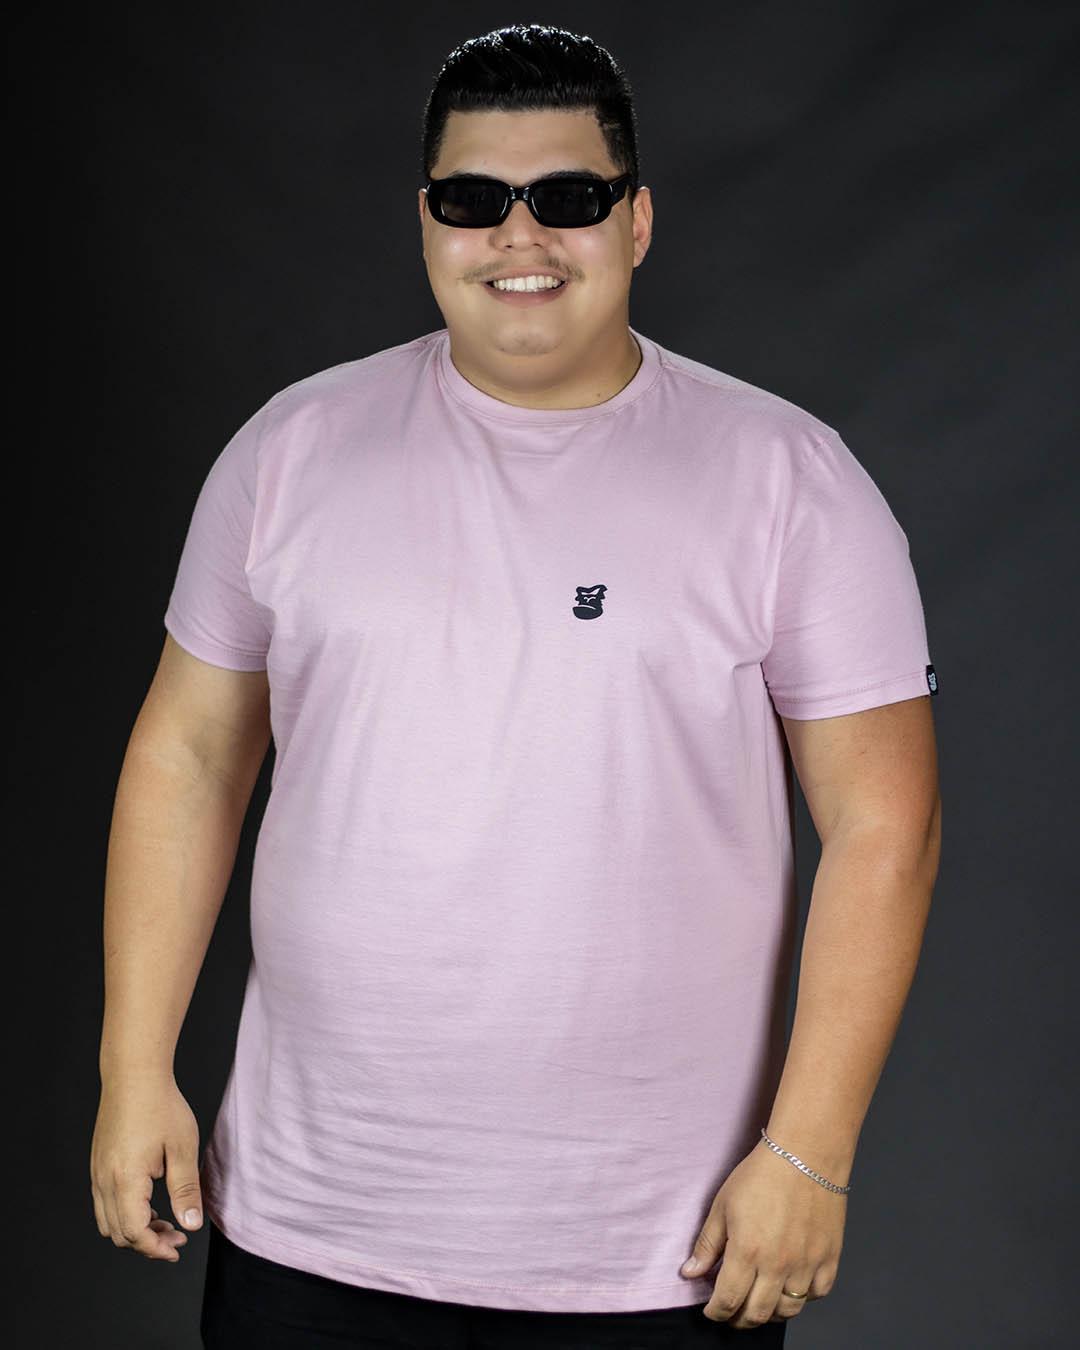 Camiseta Plus Size Rosa Morrissey Masculina